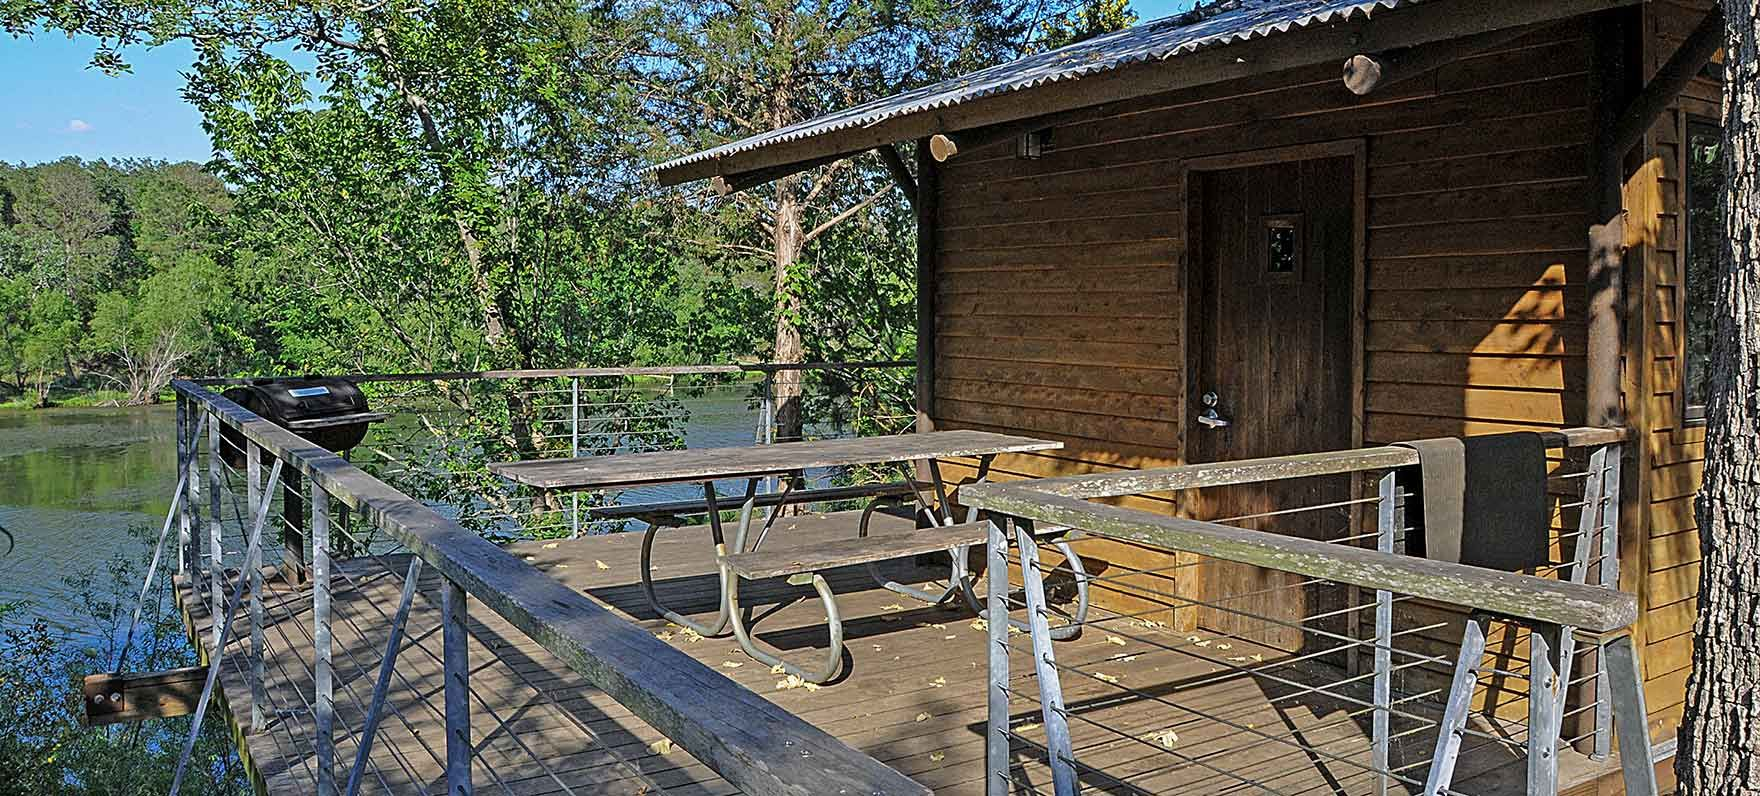 Beau Buescher State Park Limited Use Cabins U2014 Texas Parks U0026 Wildlife Department